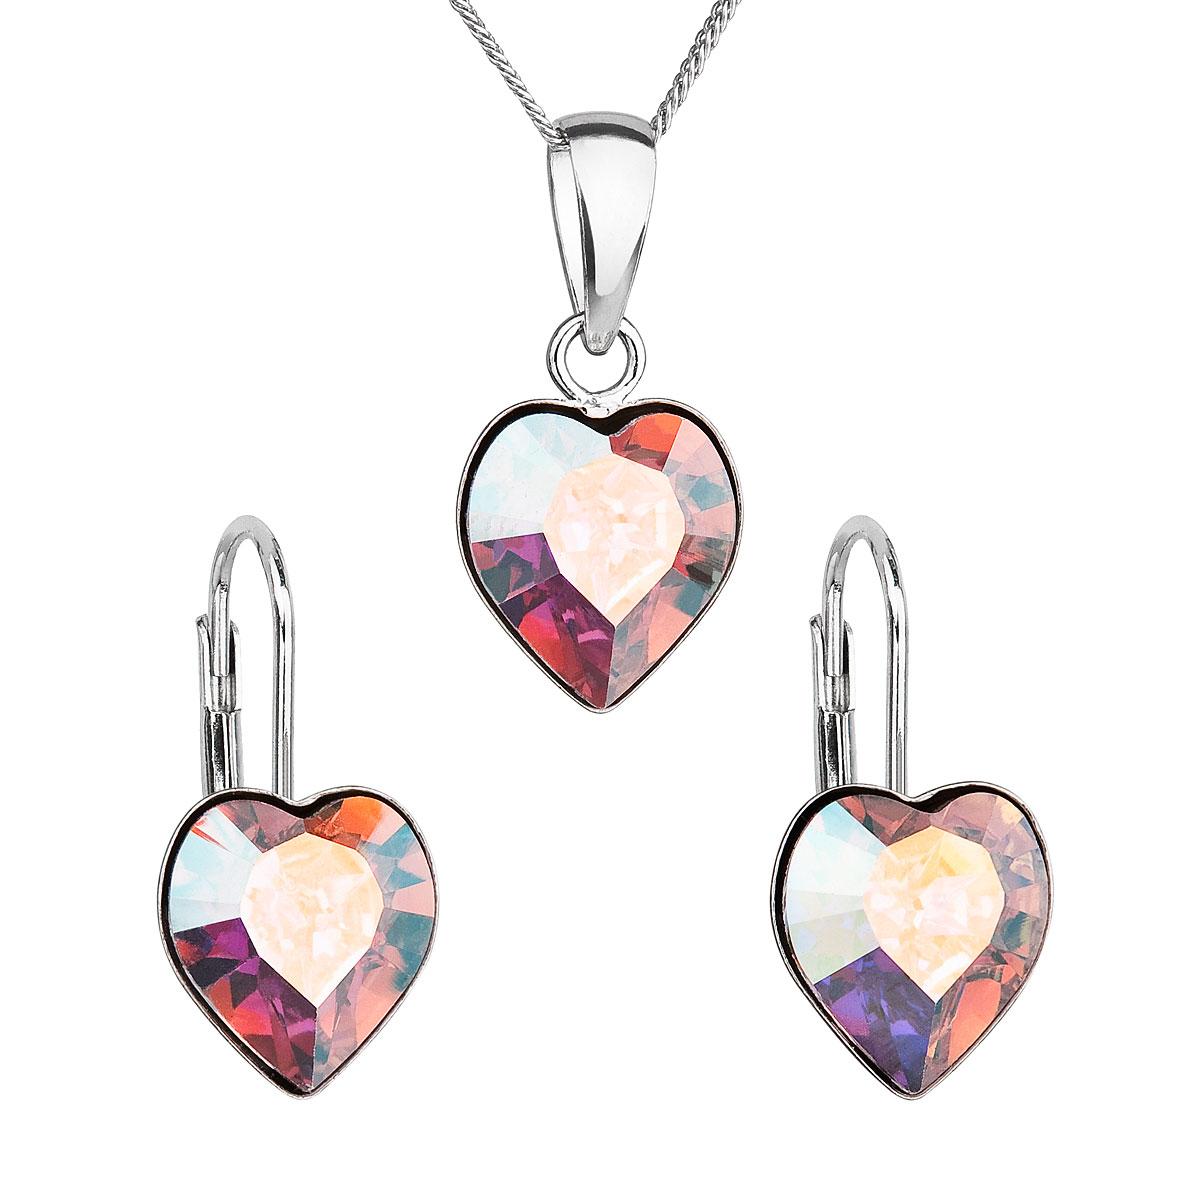 Evolution Group Sada šperků s krystaly Swarovski náušnice 3f545bc29f6